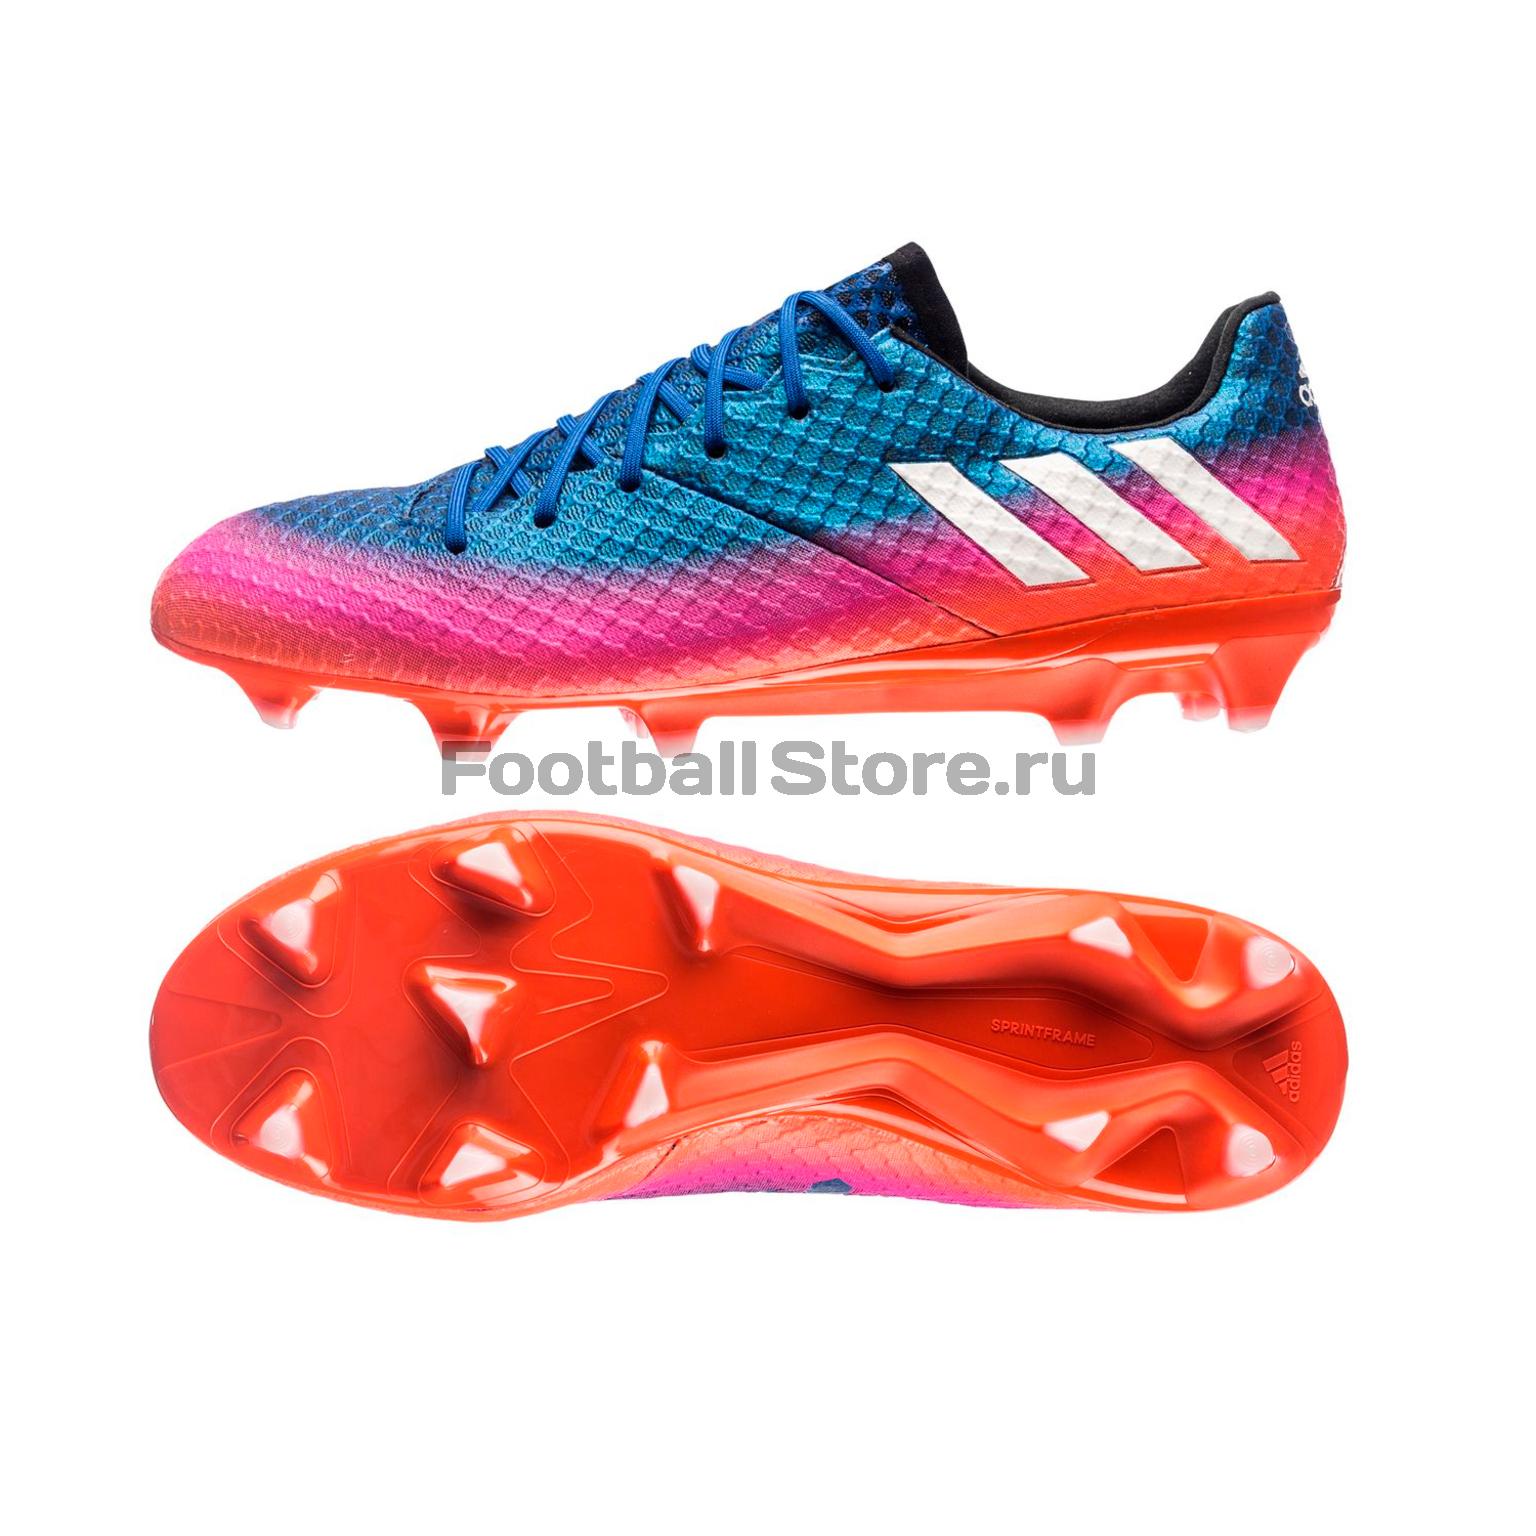 Игровые бутсы Adidas Бутсы Adidas Messi 16.1 FG BB1879